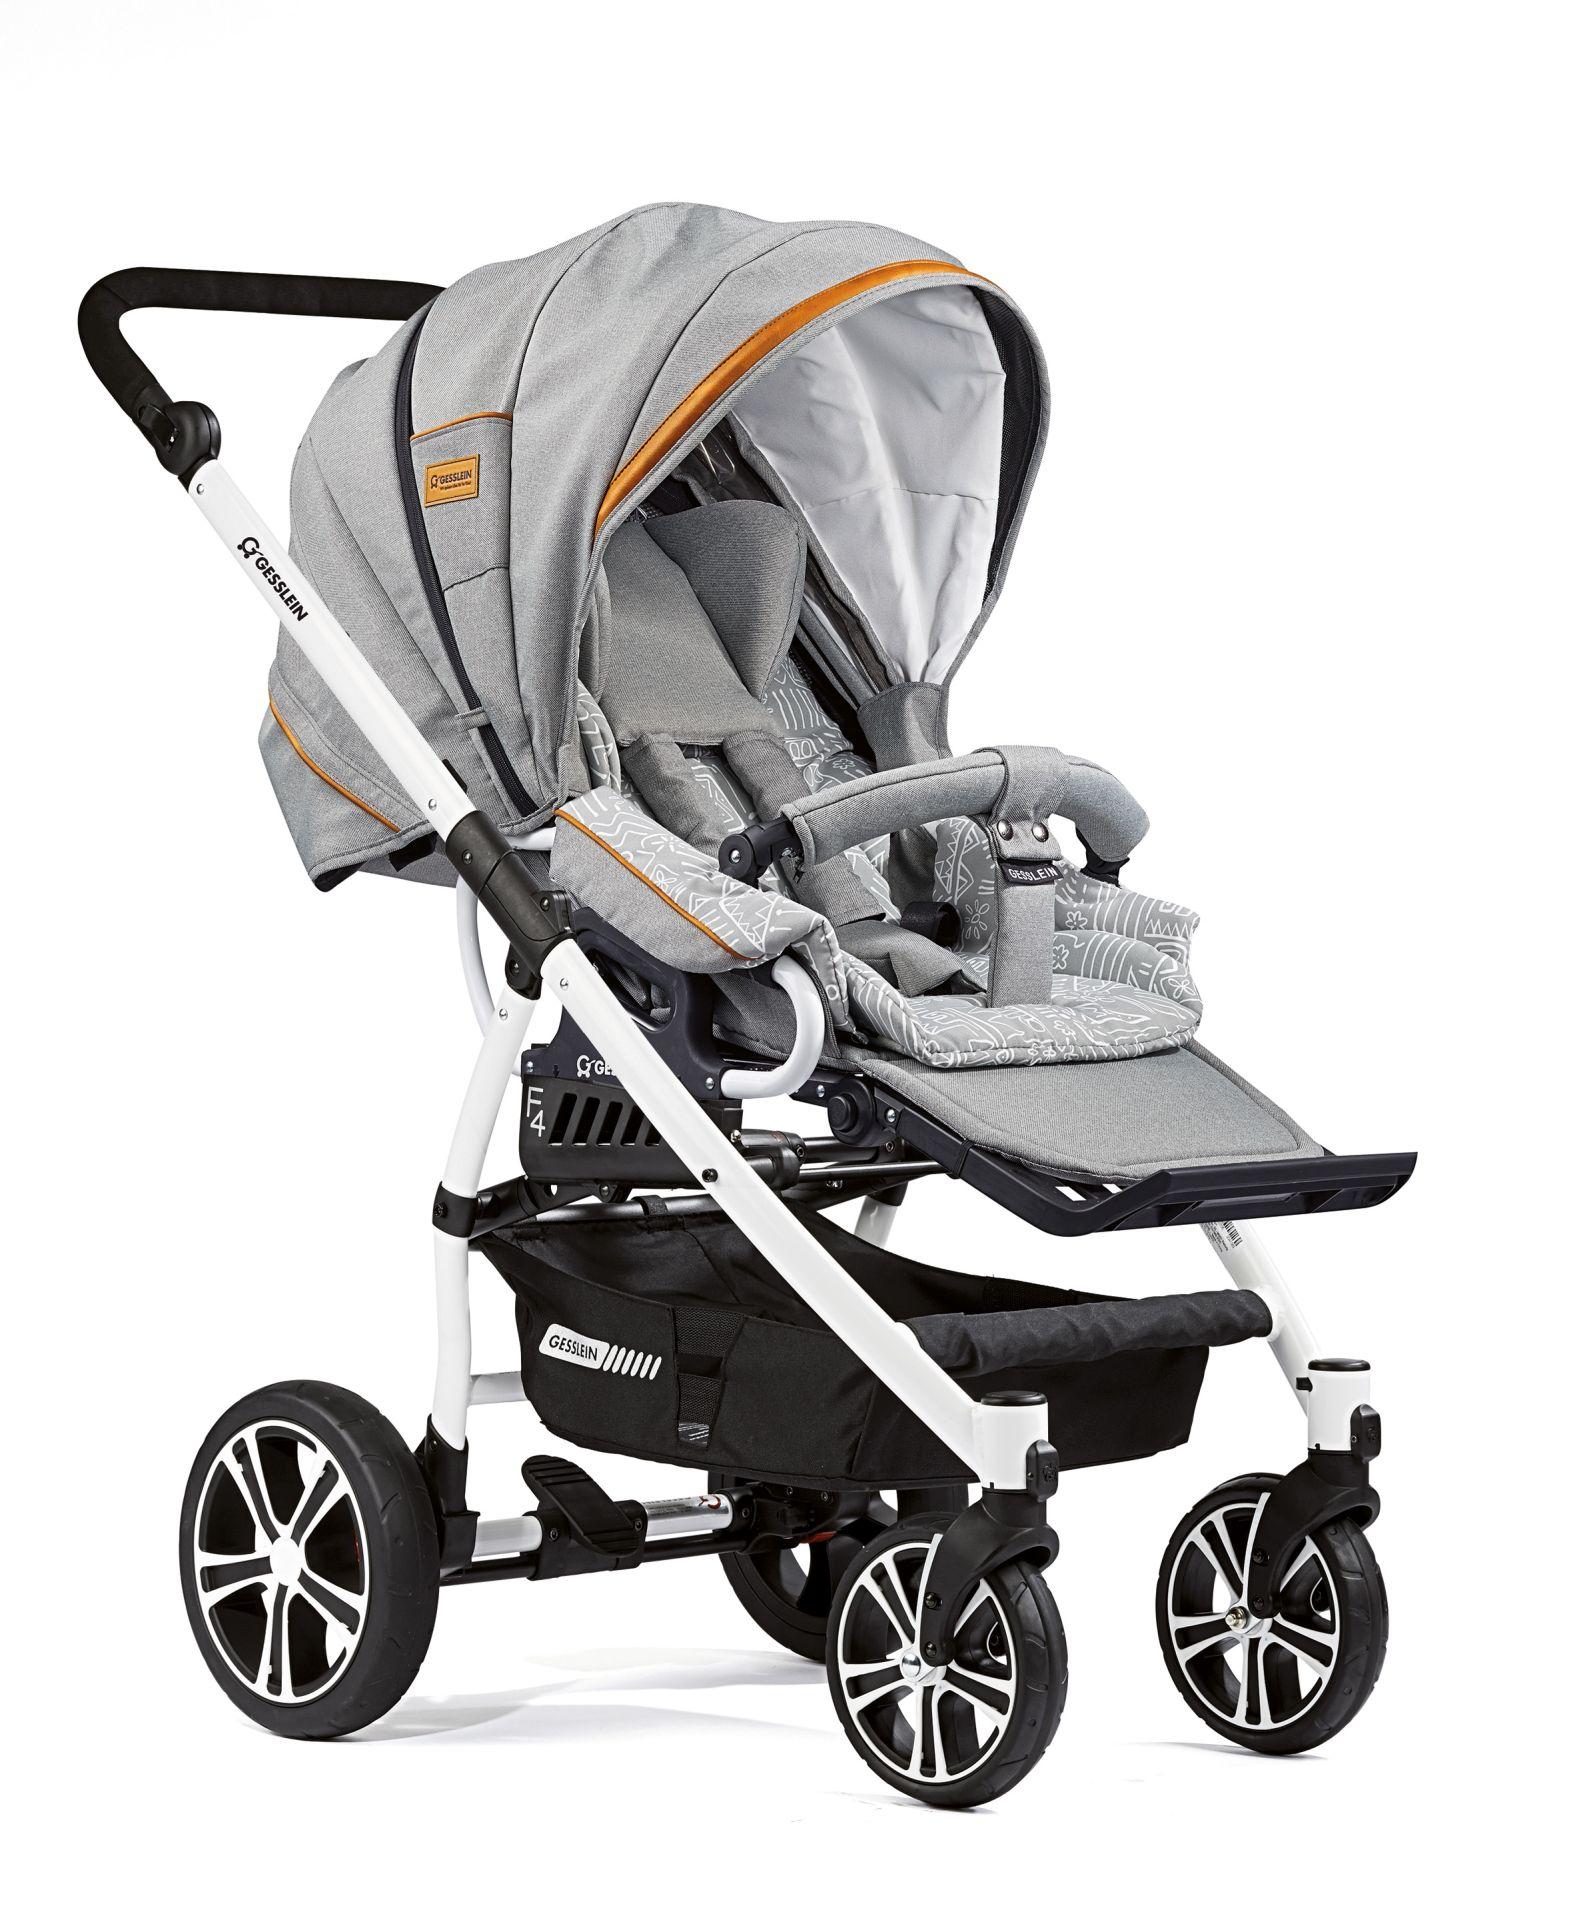 gesslein stroller f4 air 2018 663663 buy at kidsroom strollers. Black Bedroom Furniture Sets. Home Design Ideas